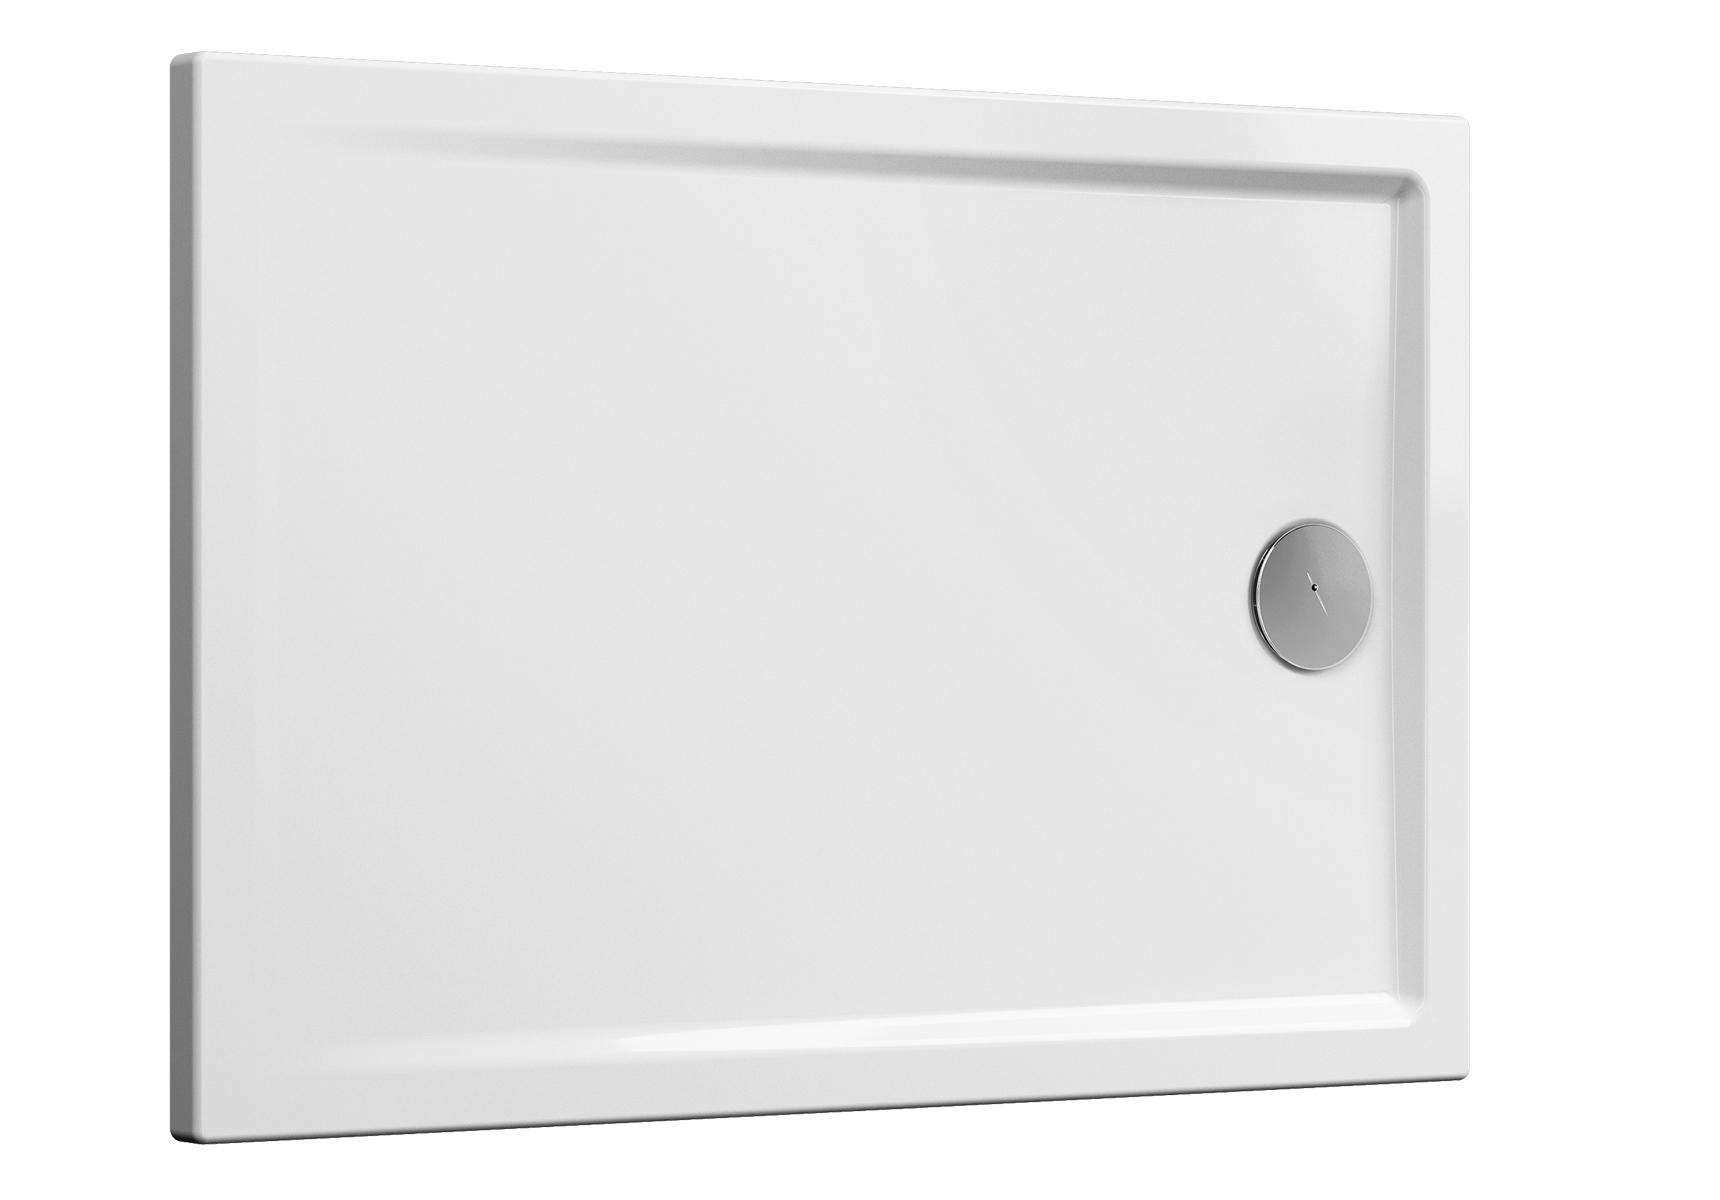 Cascade receveur ultra plat en céramique, 120  x  80 cm, blanc mat